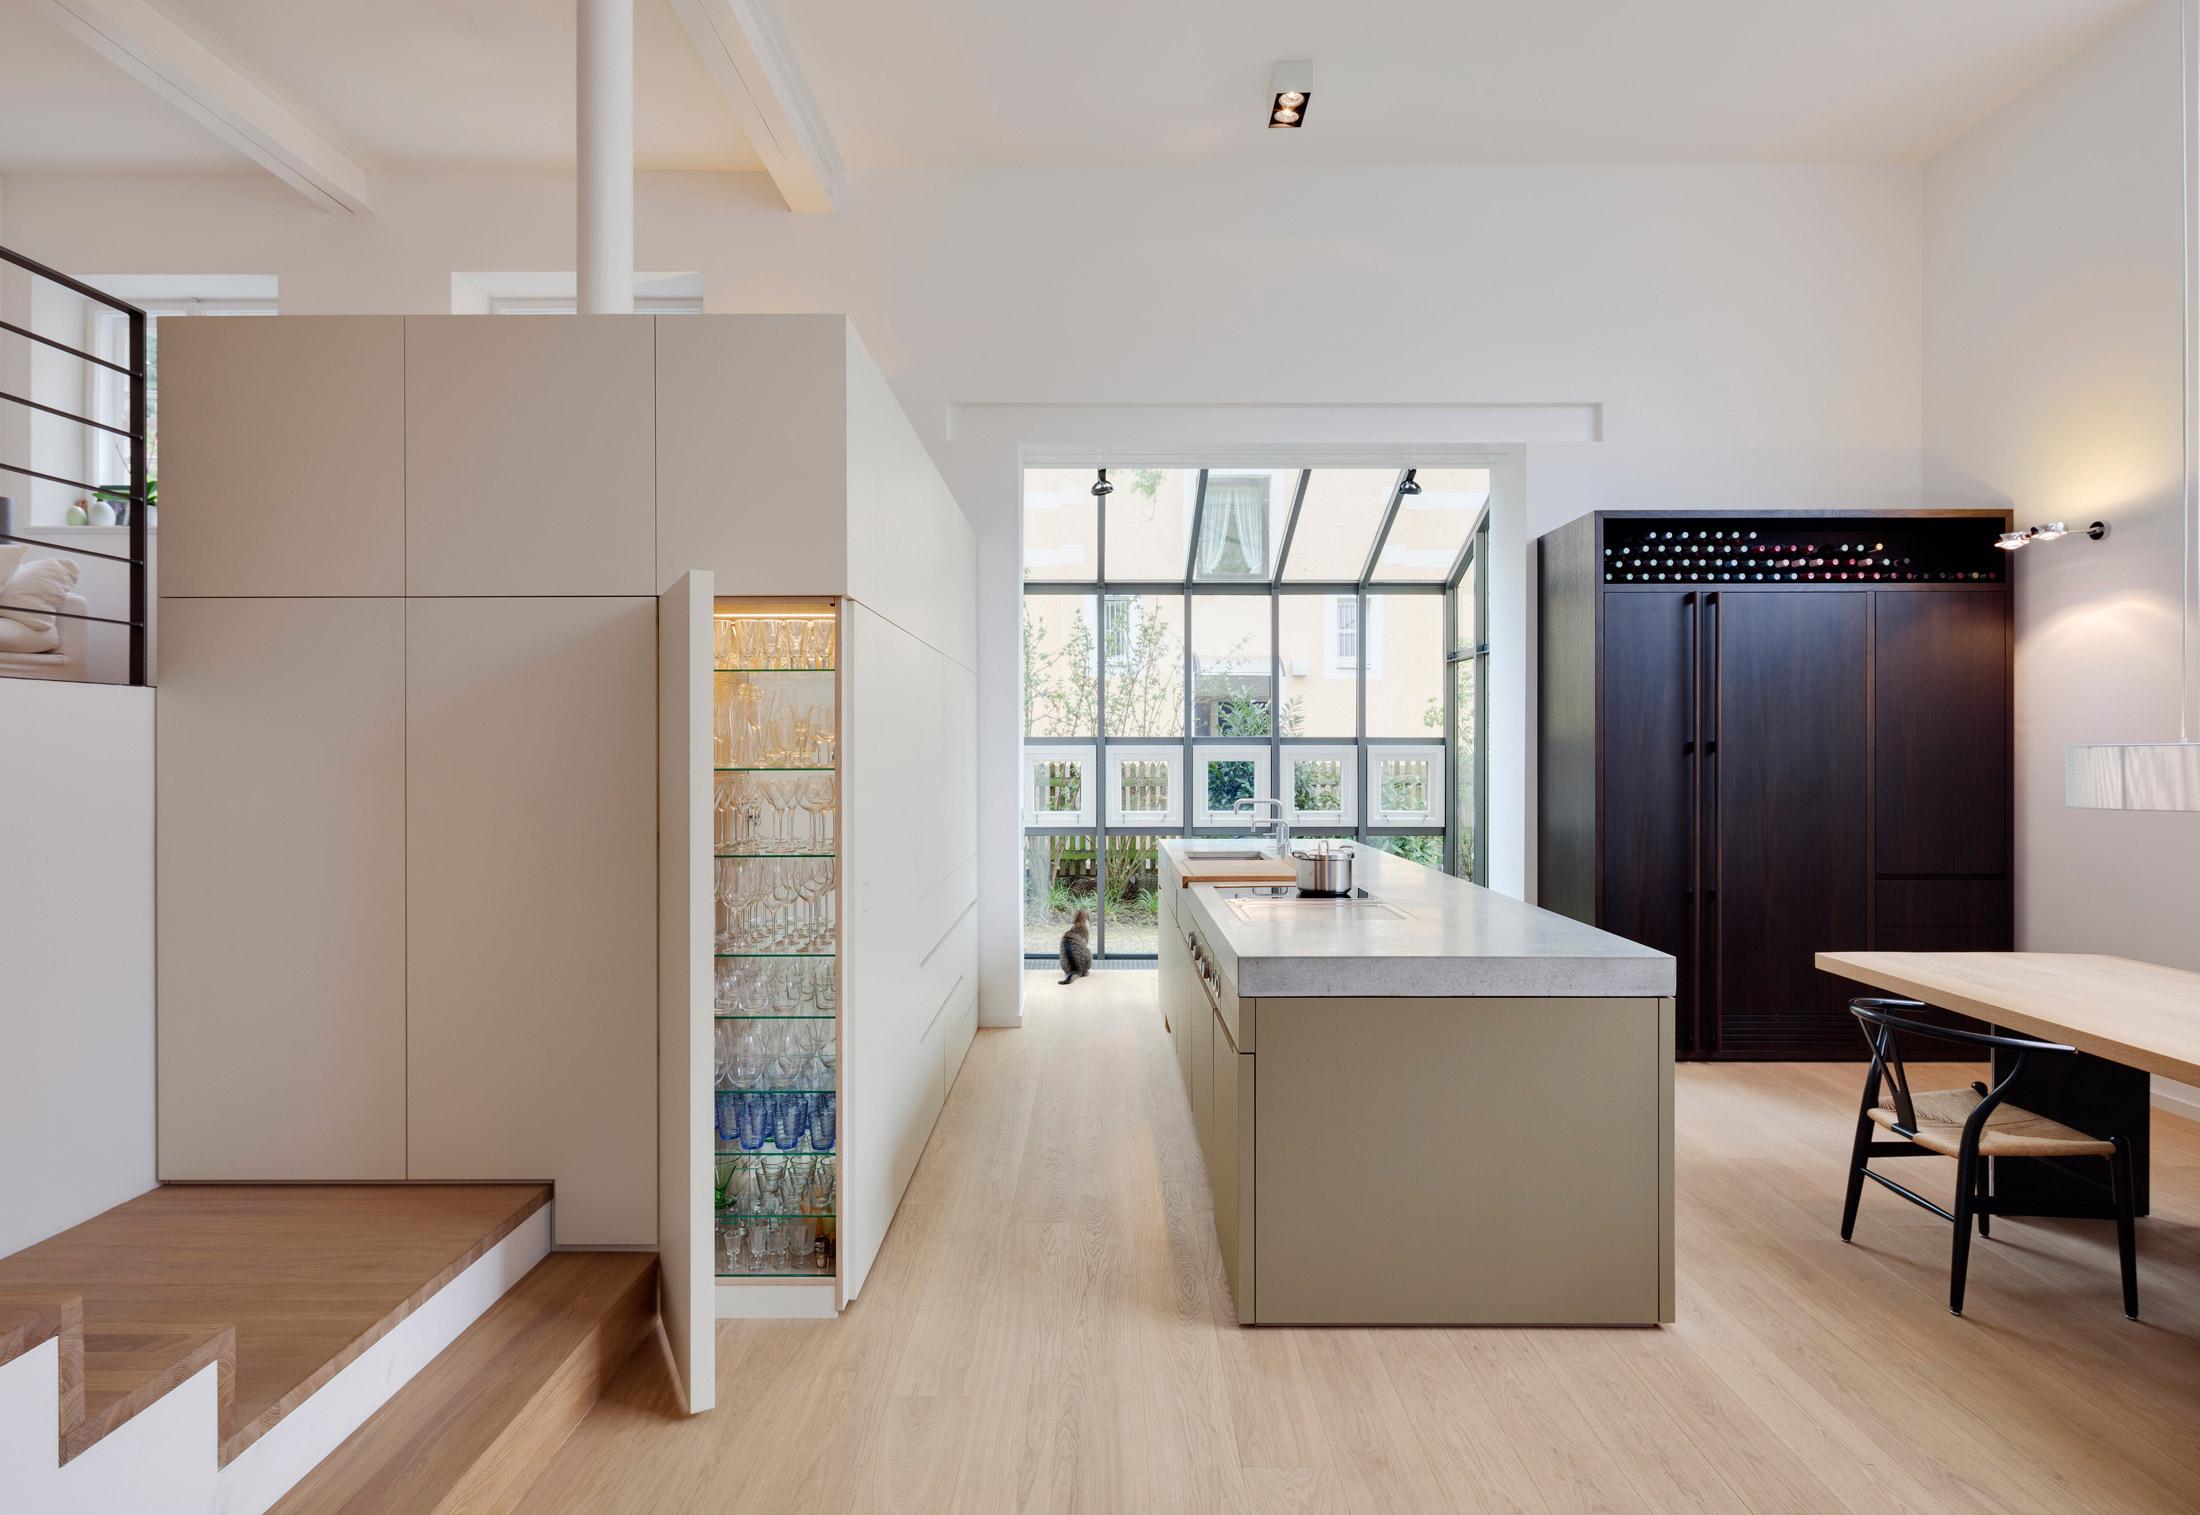 kitchen d45 by holzrausch stylepark. Black Bedroom Furniture Sets. Home Design Ideas